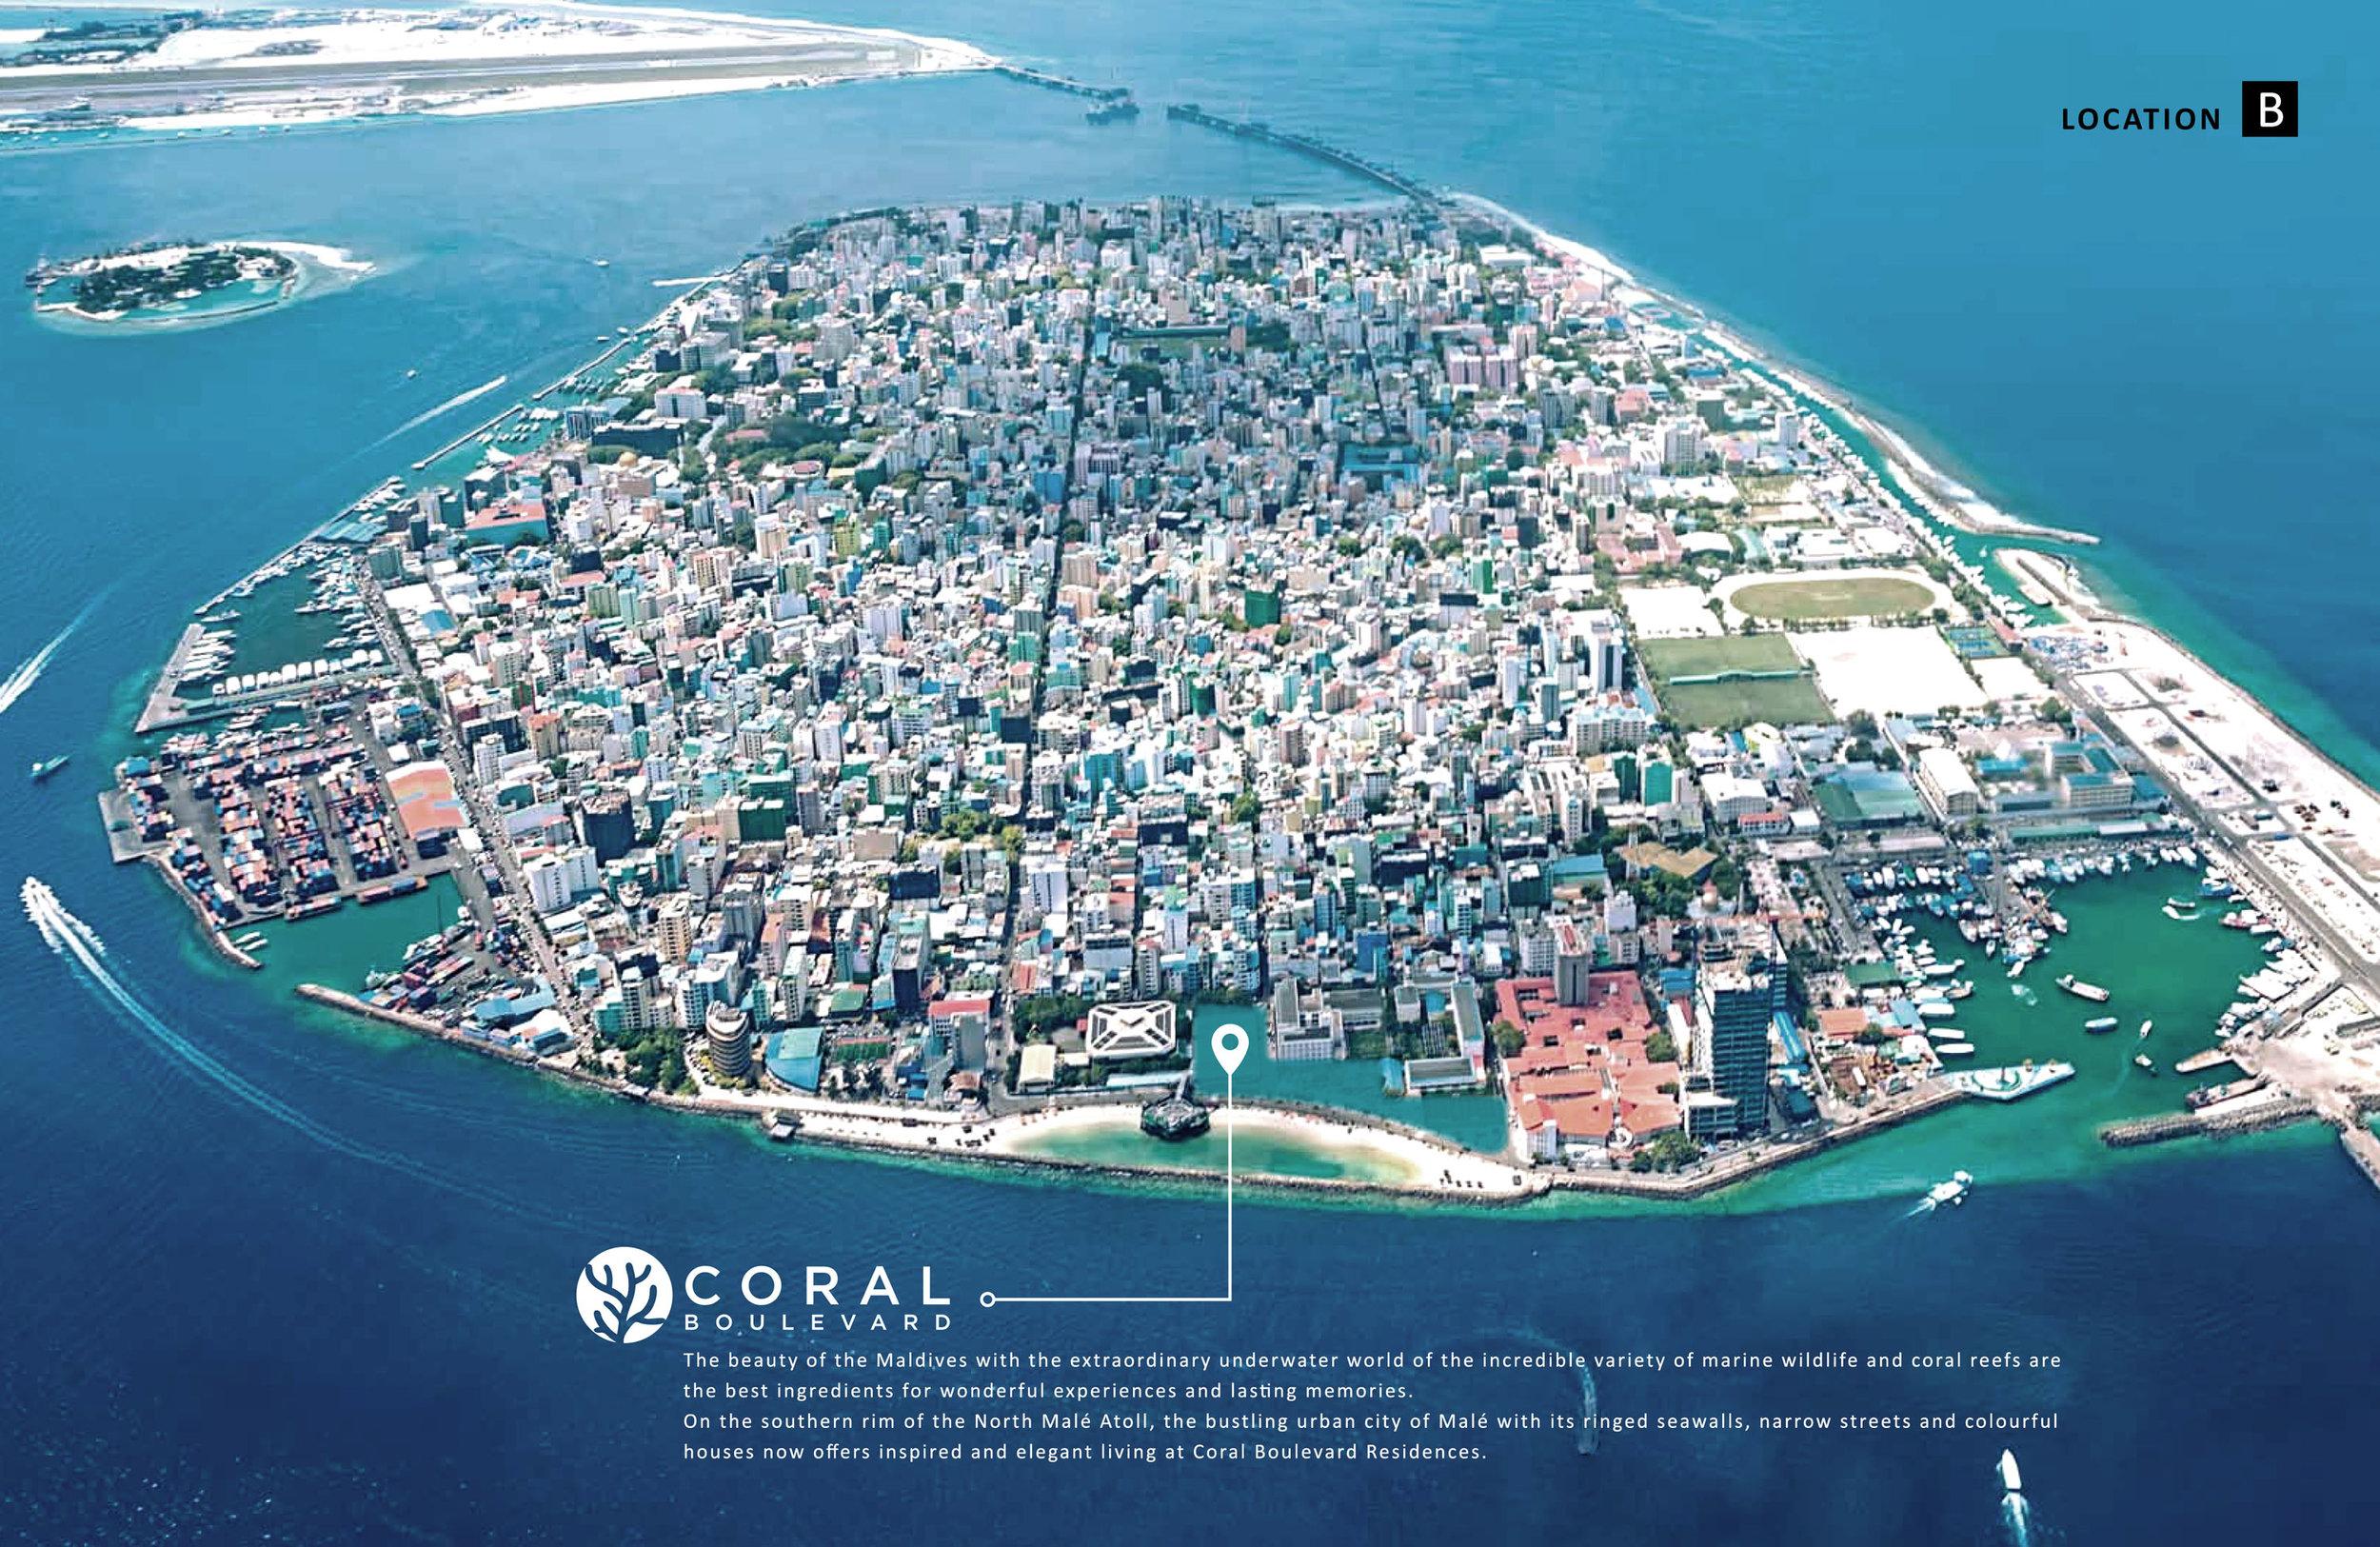 IPA_Coral Boulevard_pages_B-2.jpg